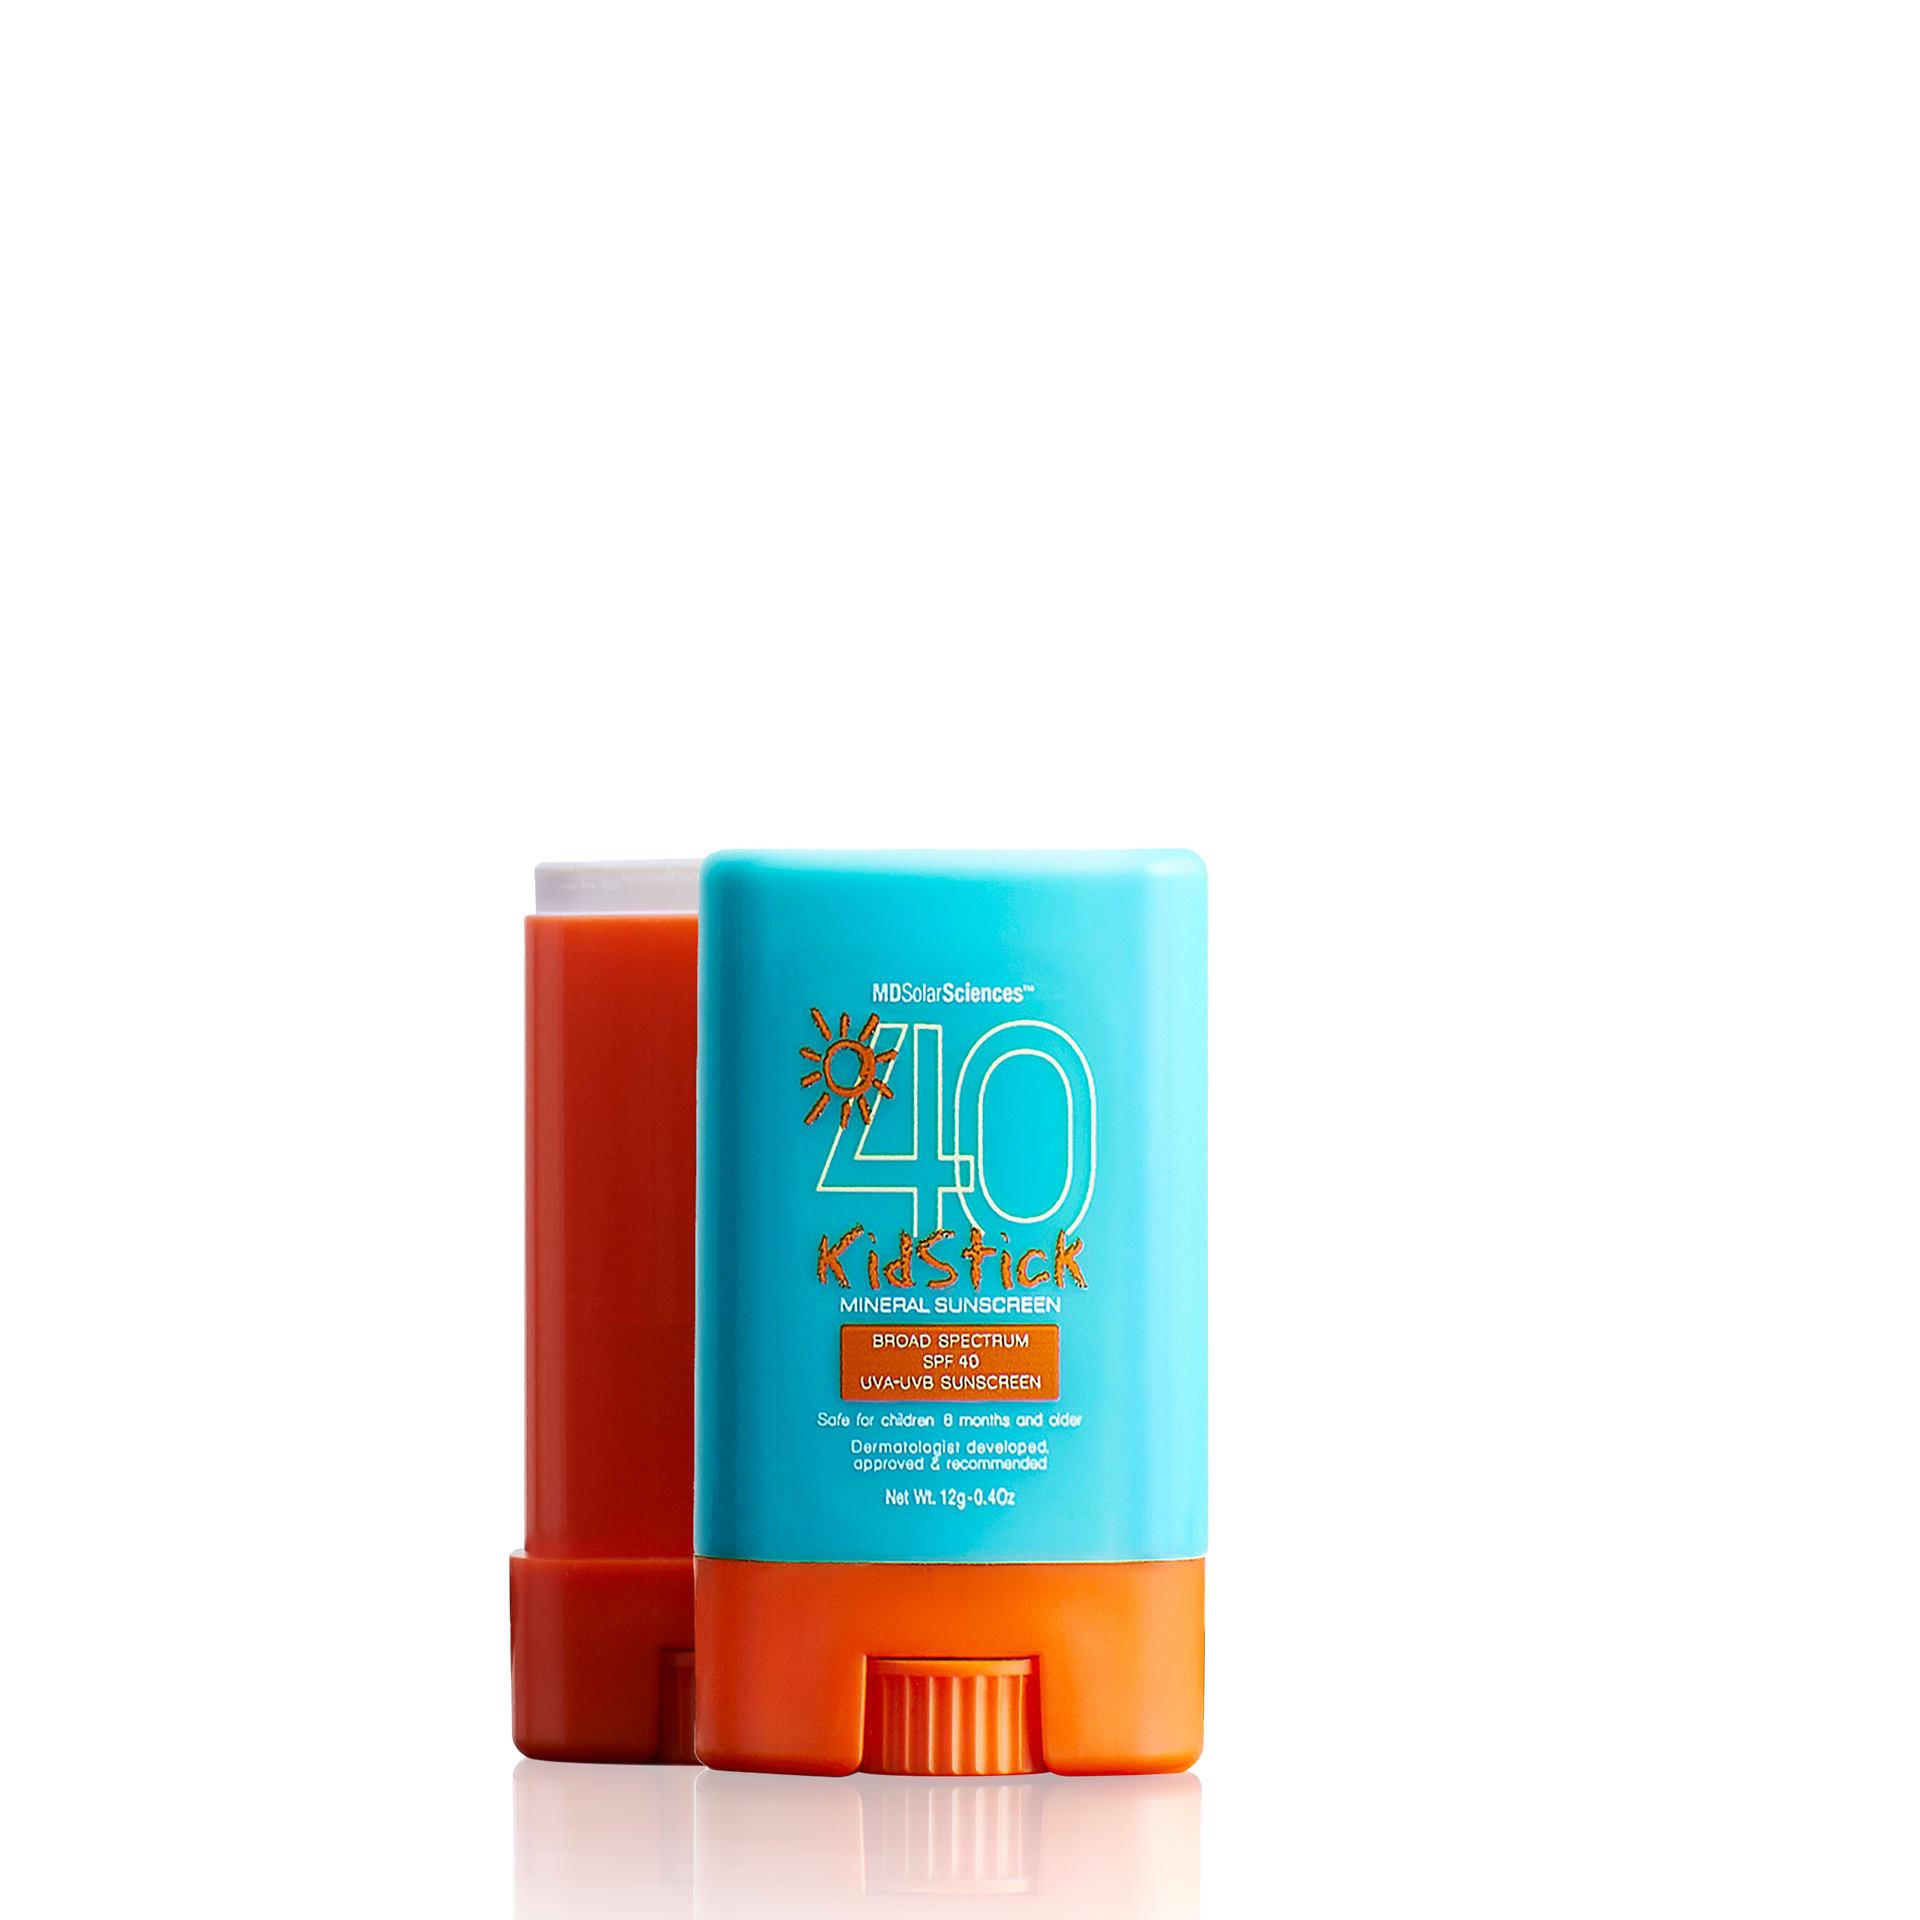 MDSolarSciences Mineral Sunscreen KidStick SPF 40 (.4 oz)